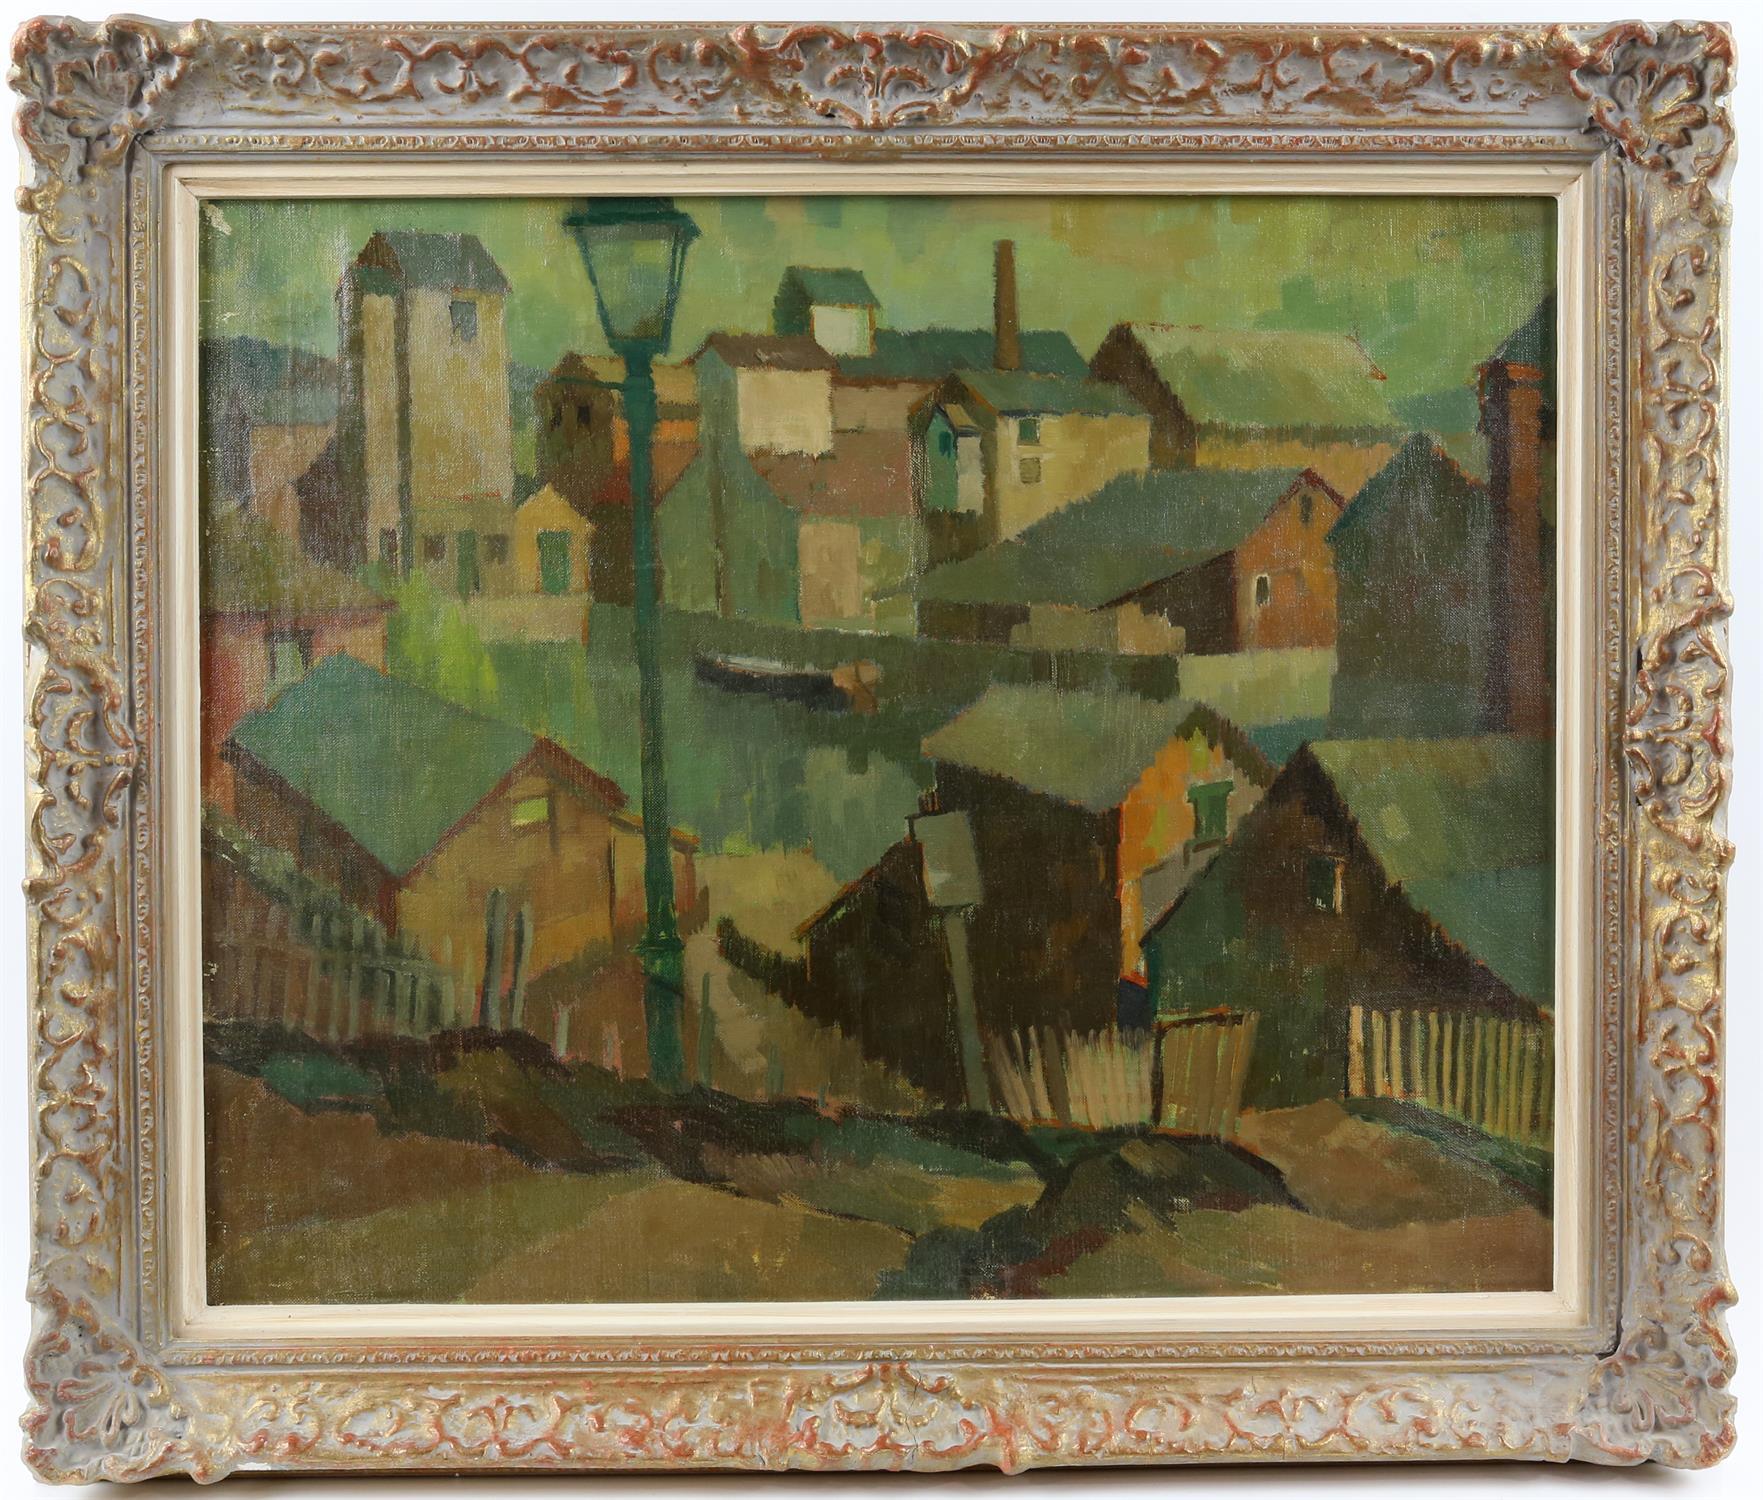 Clifford Charman, (British 1910-1993), 'English Town', oil on canvas, 46cm x 57cm, - Image 2 of 3